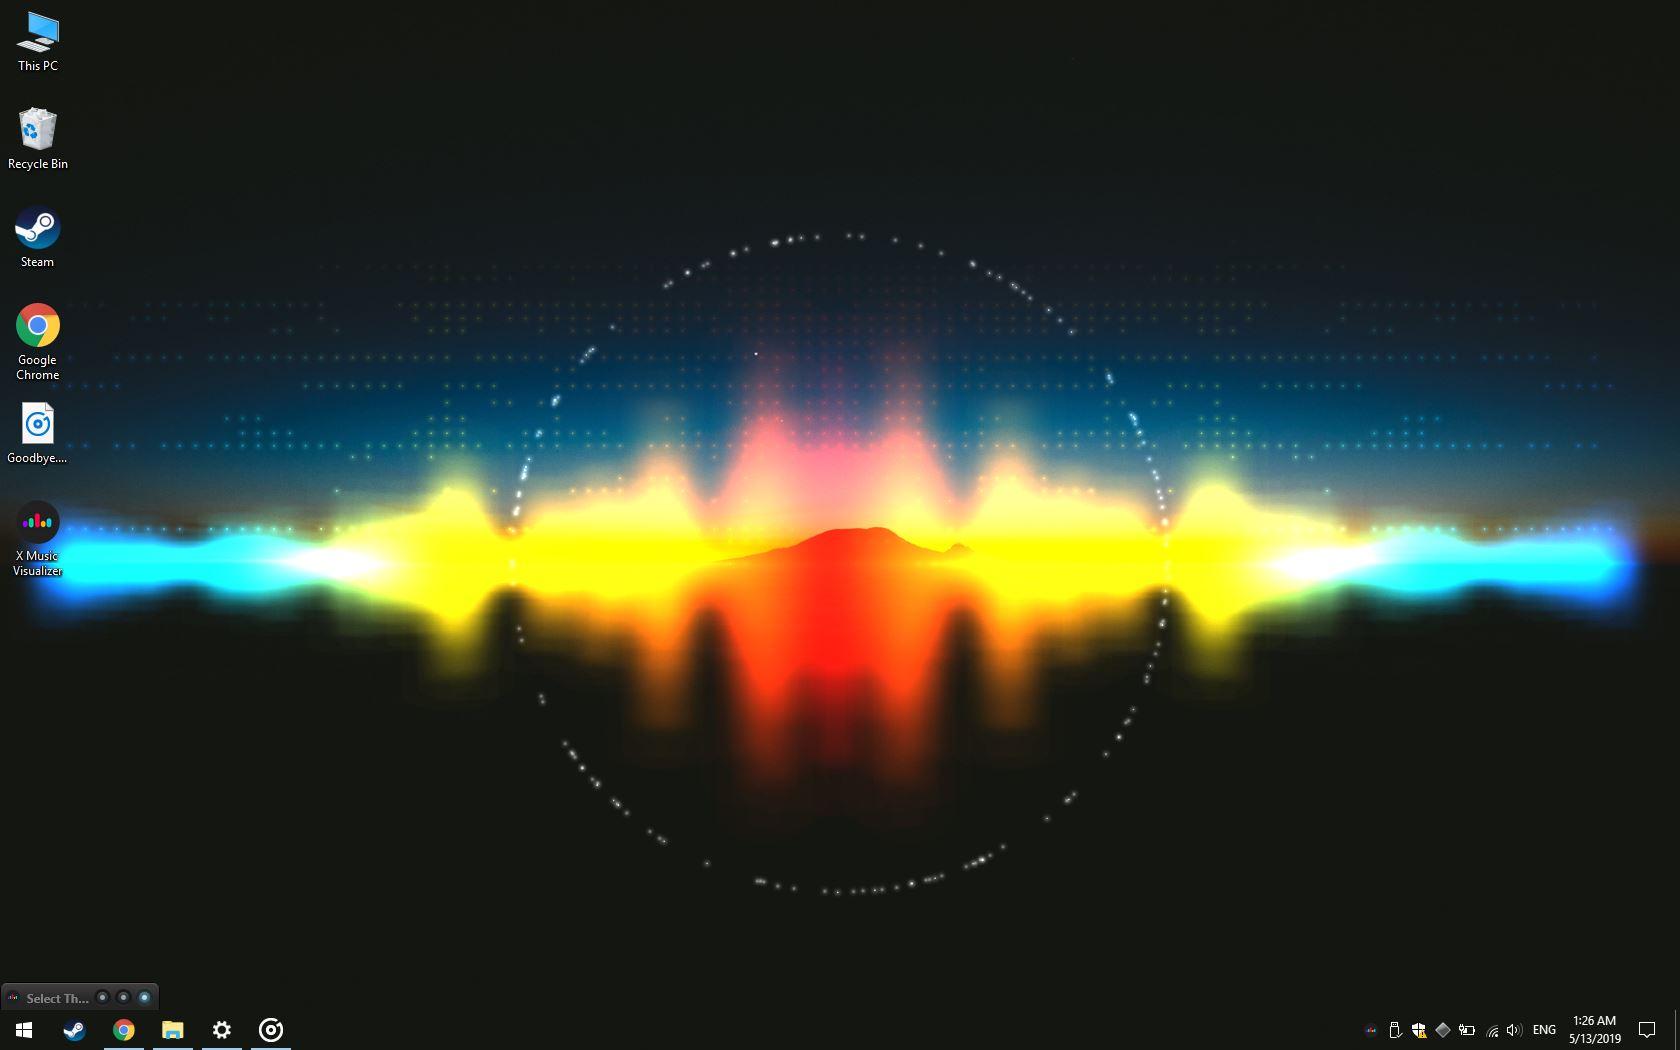 Music Visualizer Working Live Music - HD Wallpaper